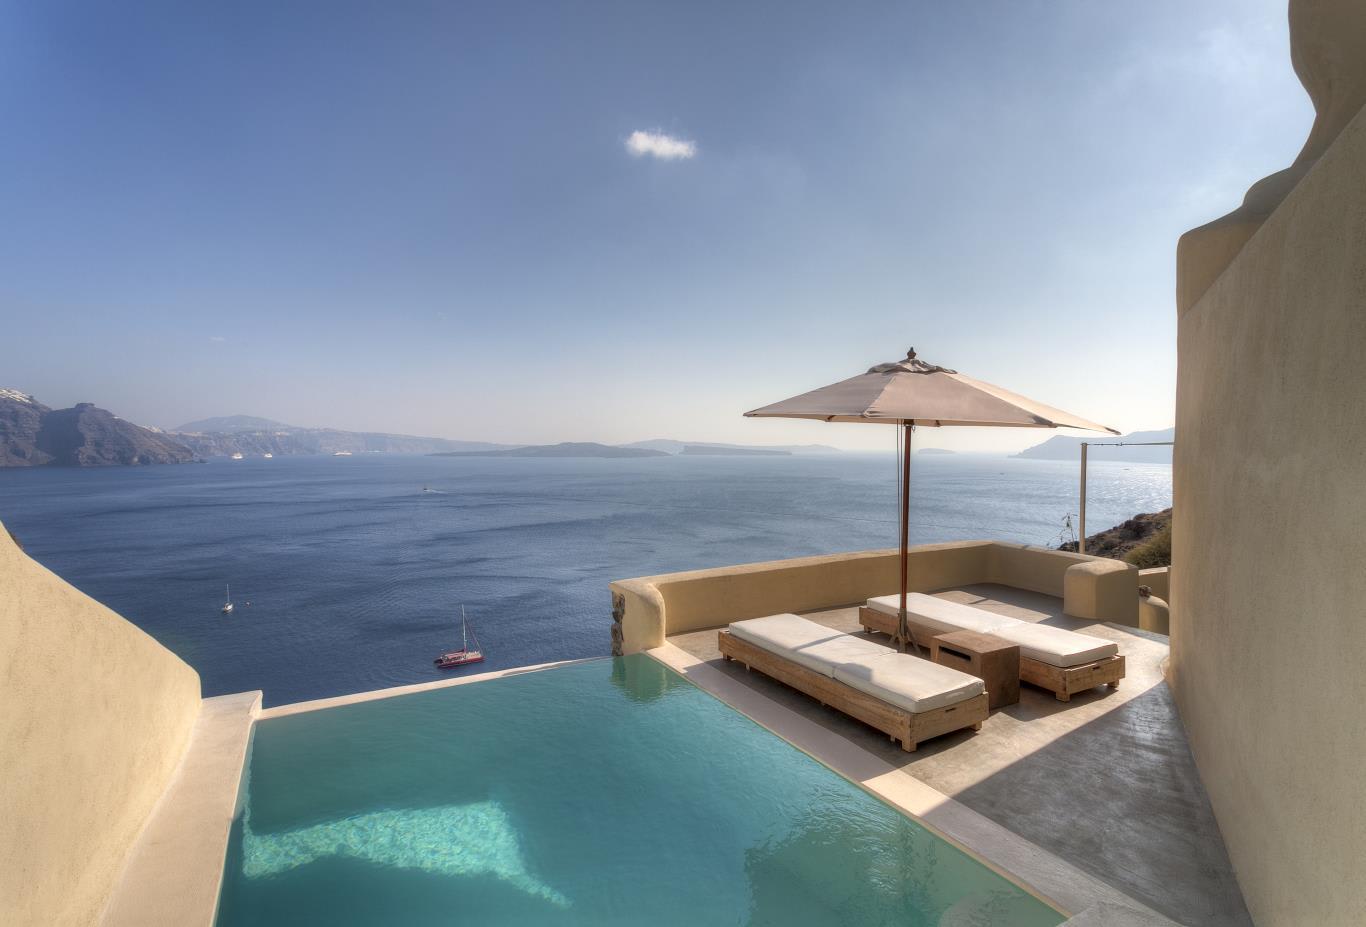 Mystery pool villa